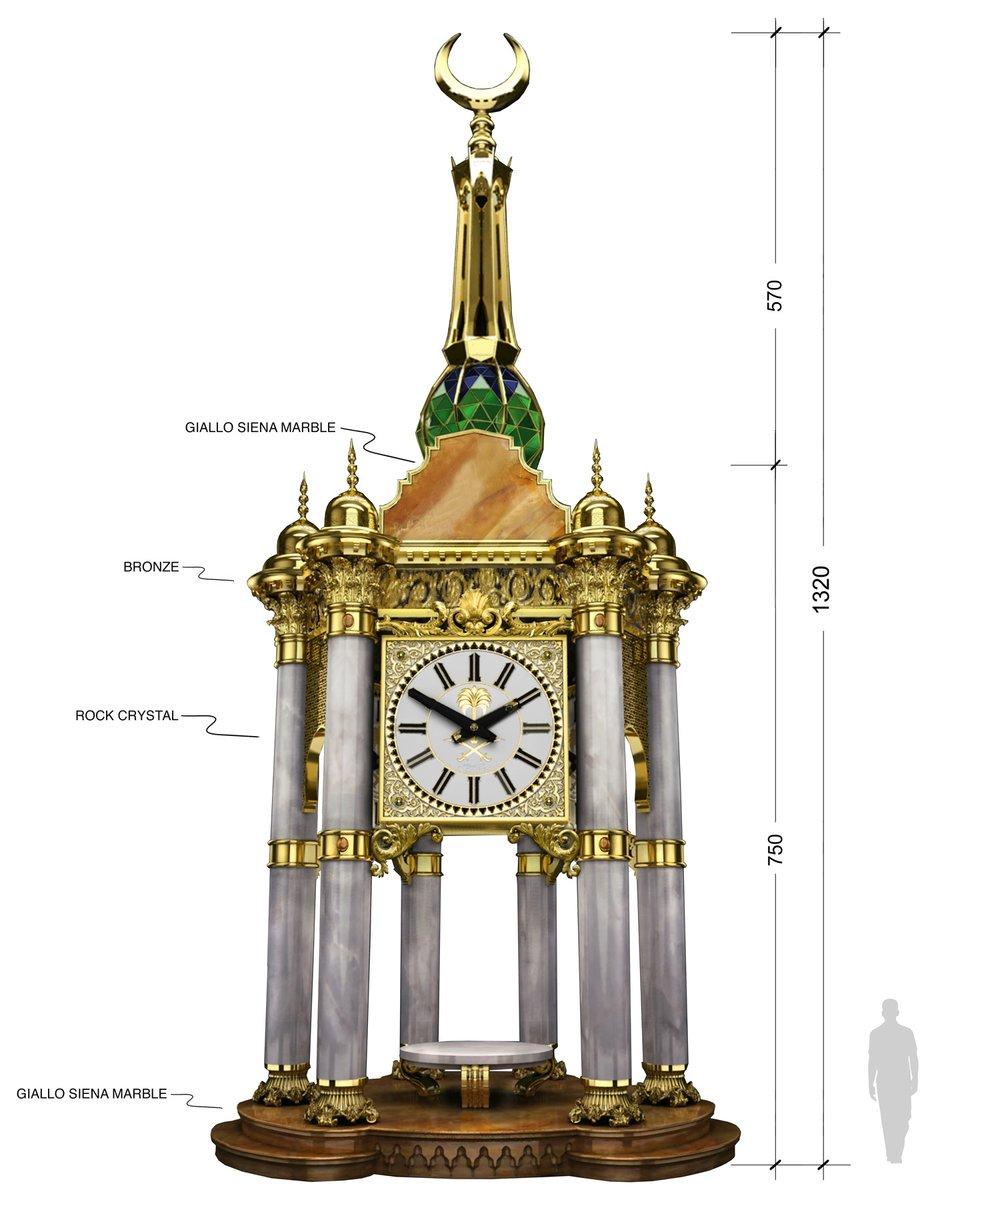 orologio-3.jpg